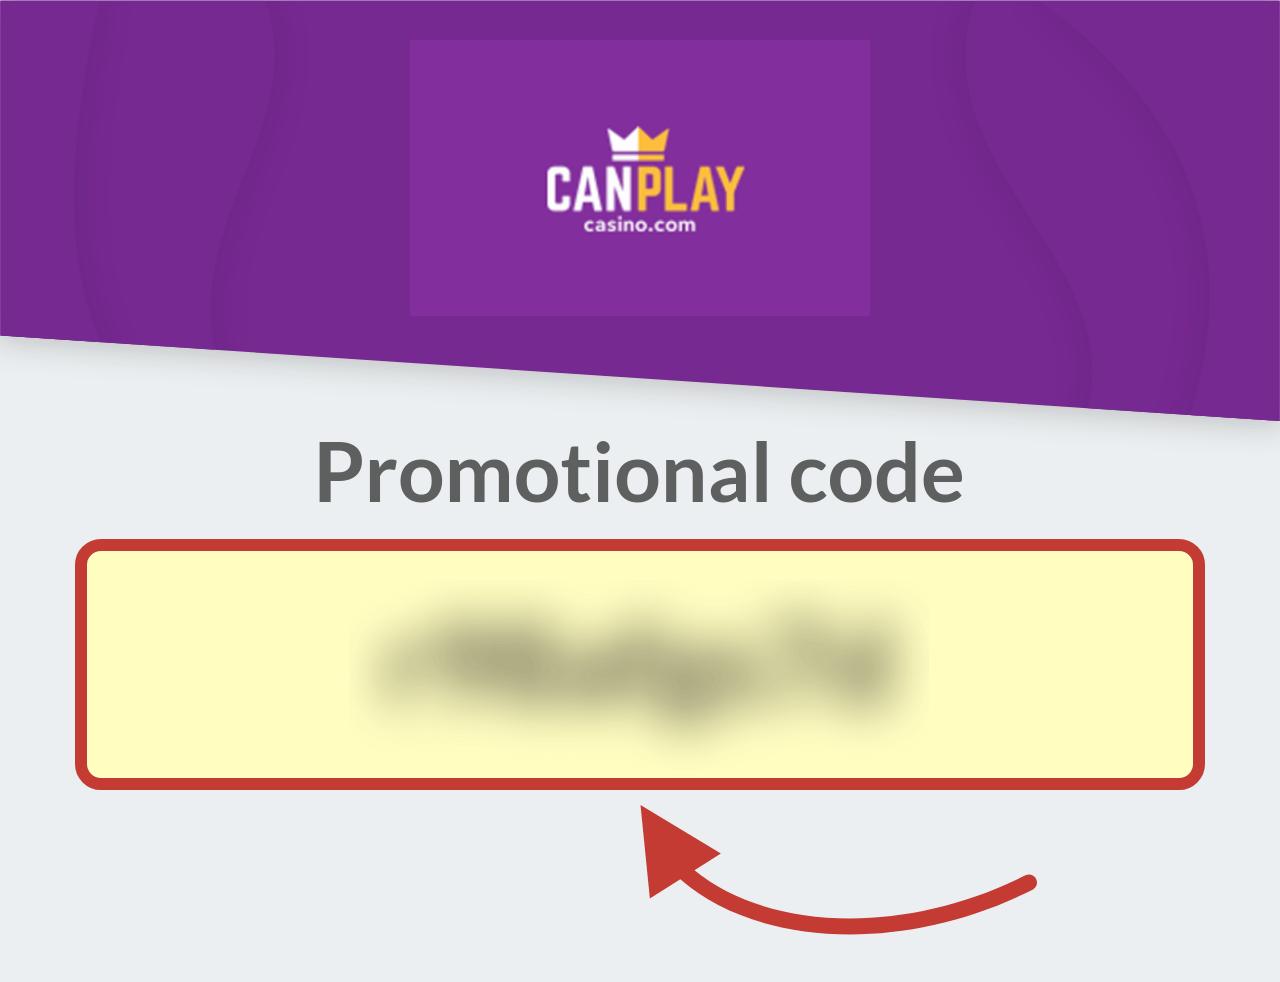 CanPlay Casino Promotional Code